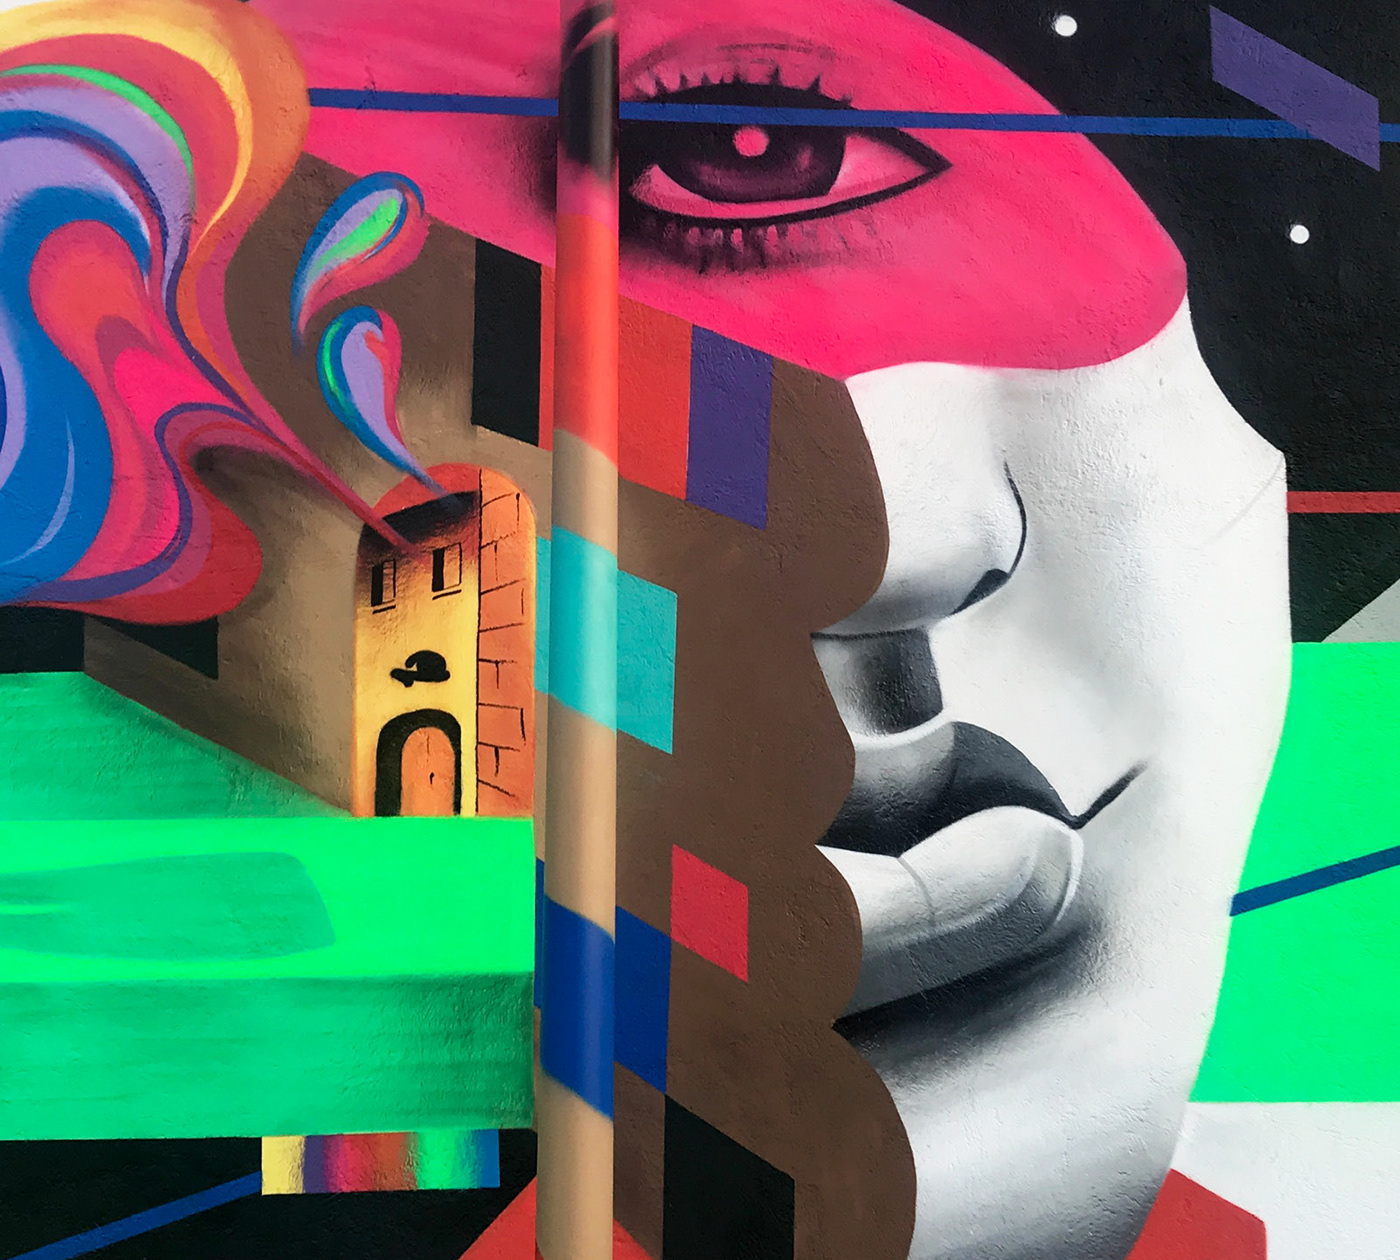 Street Art  Mural Gender equality women art video women rights equality female urban art